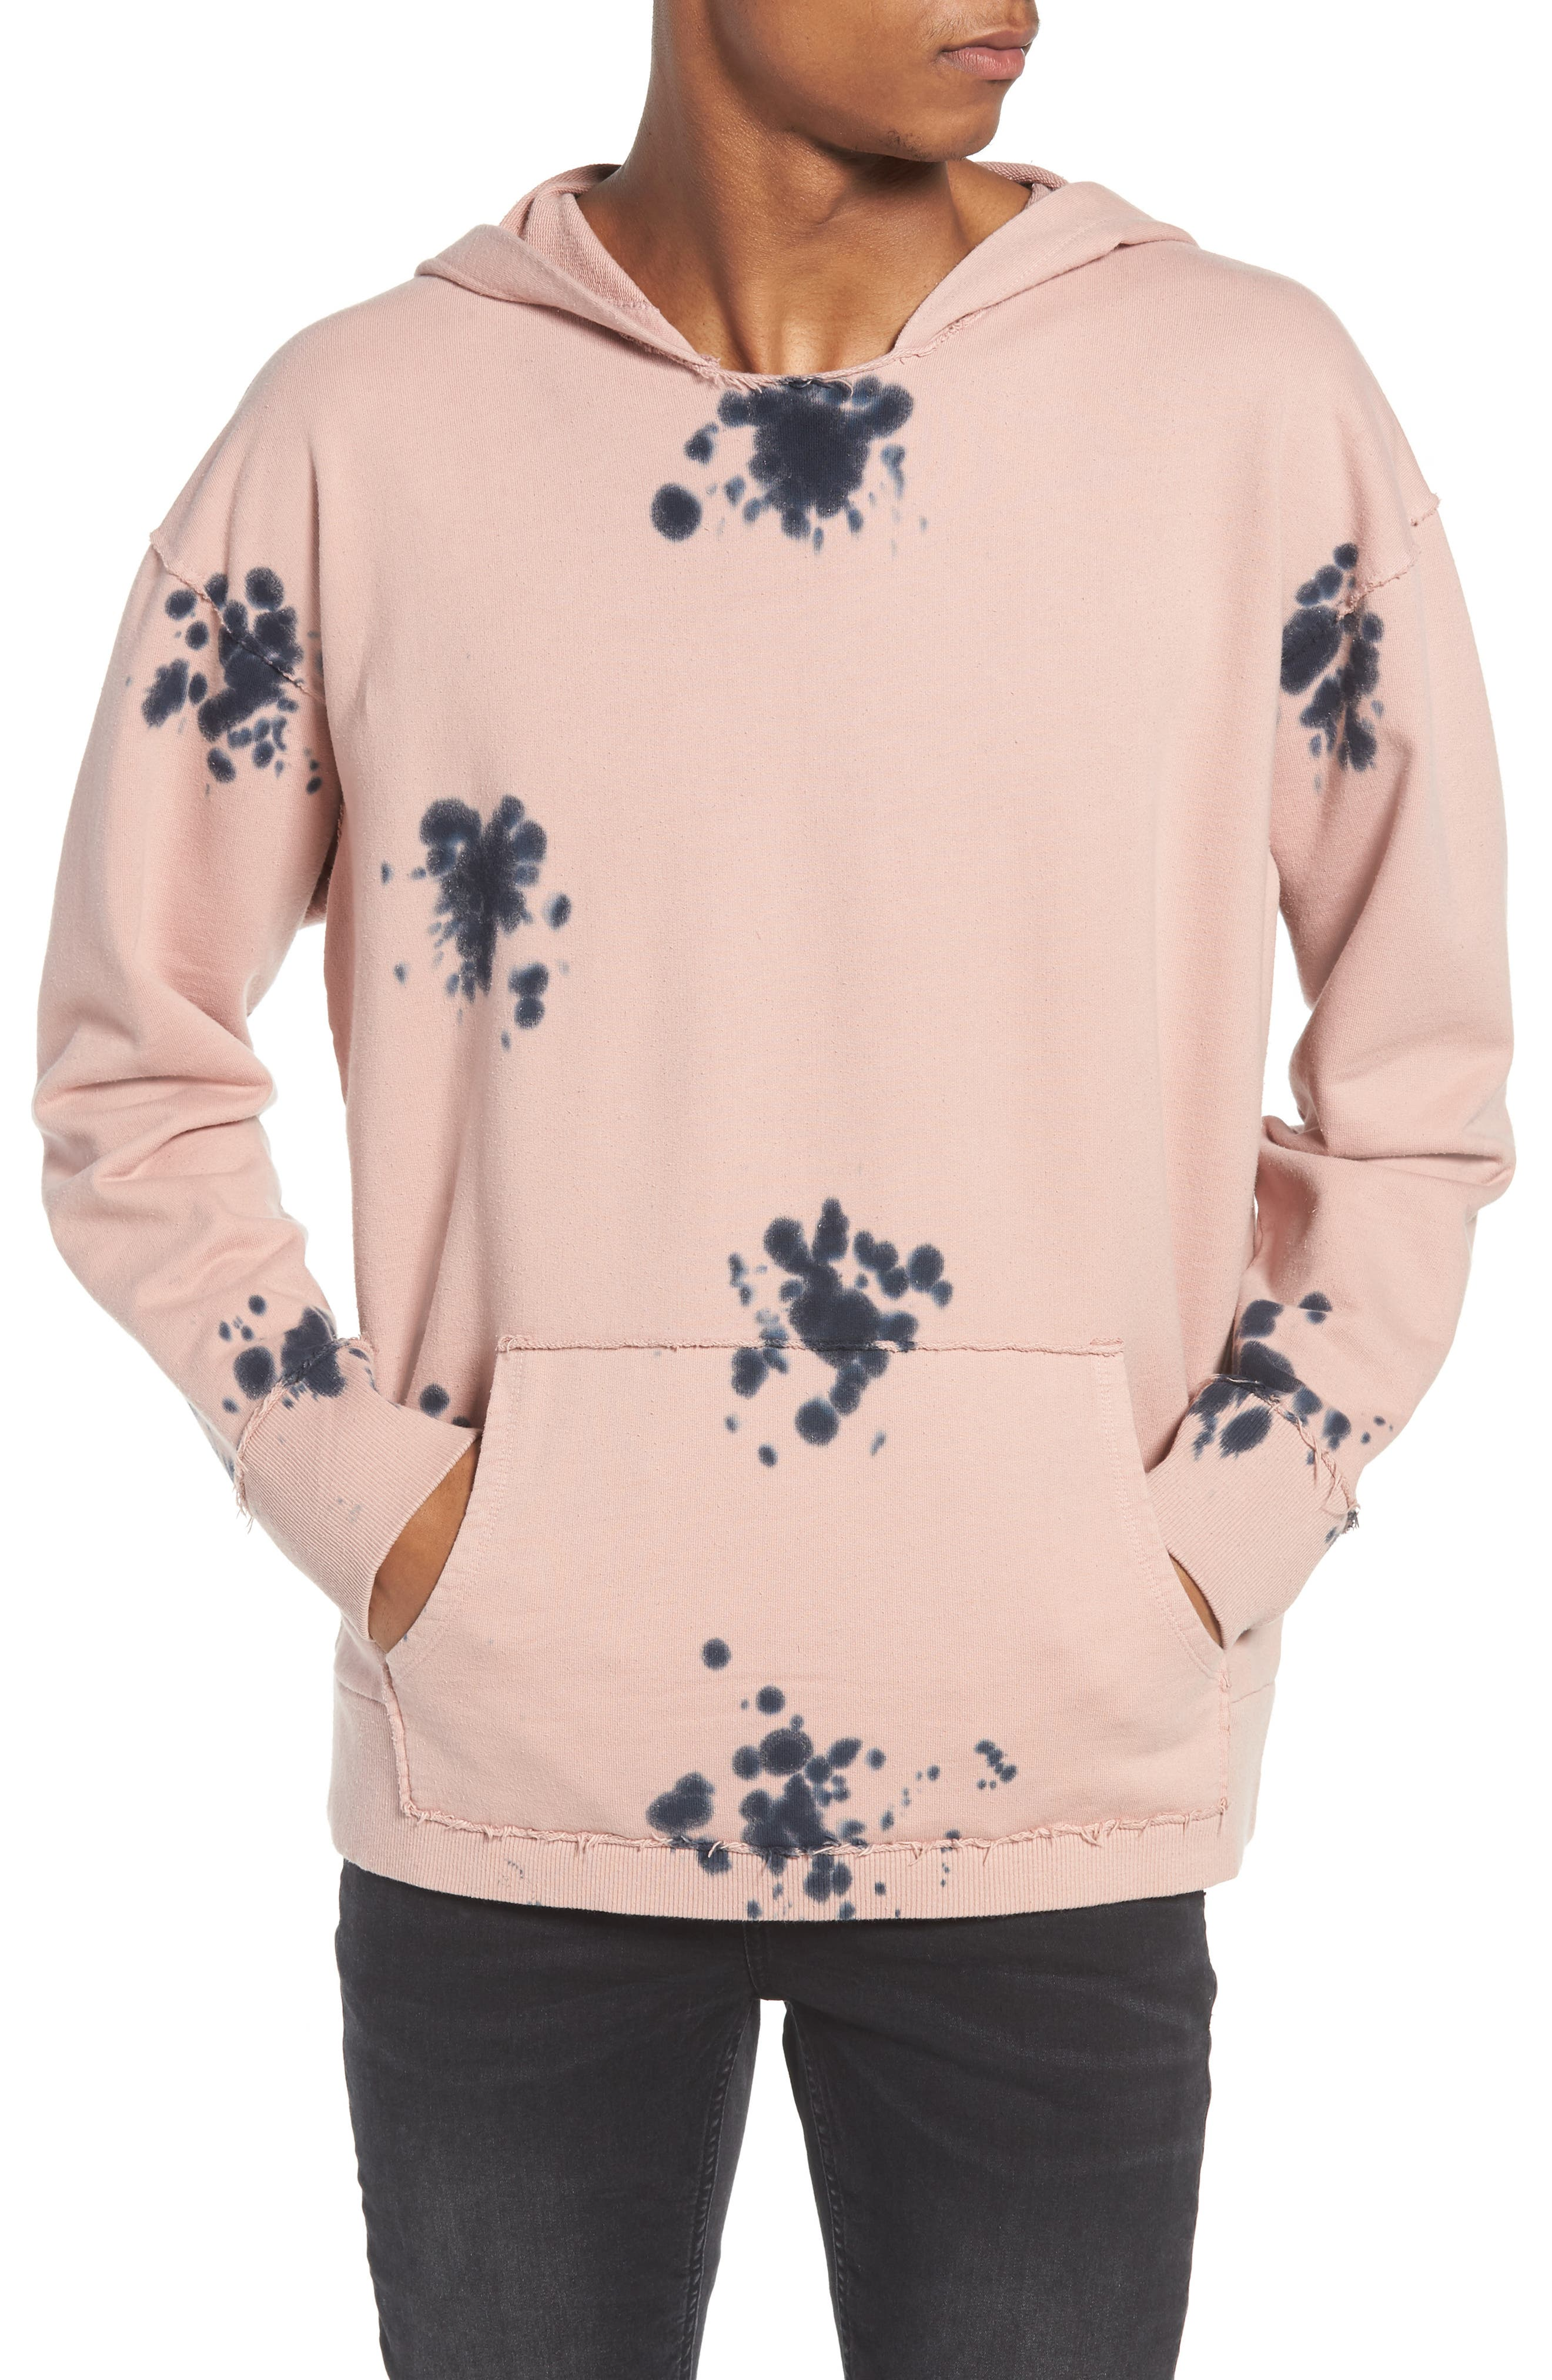 Blotch Tie Dye Terry Hoodie,                         Main,                         color, Pink Silver Navy Blotch Dye